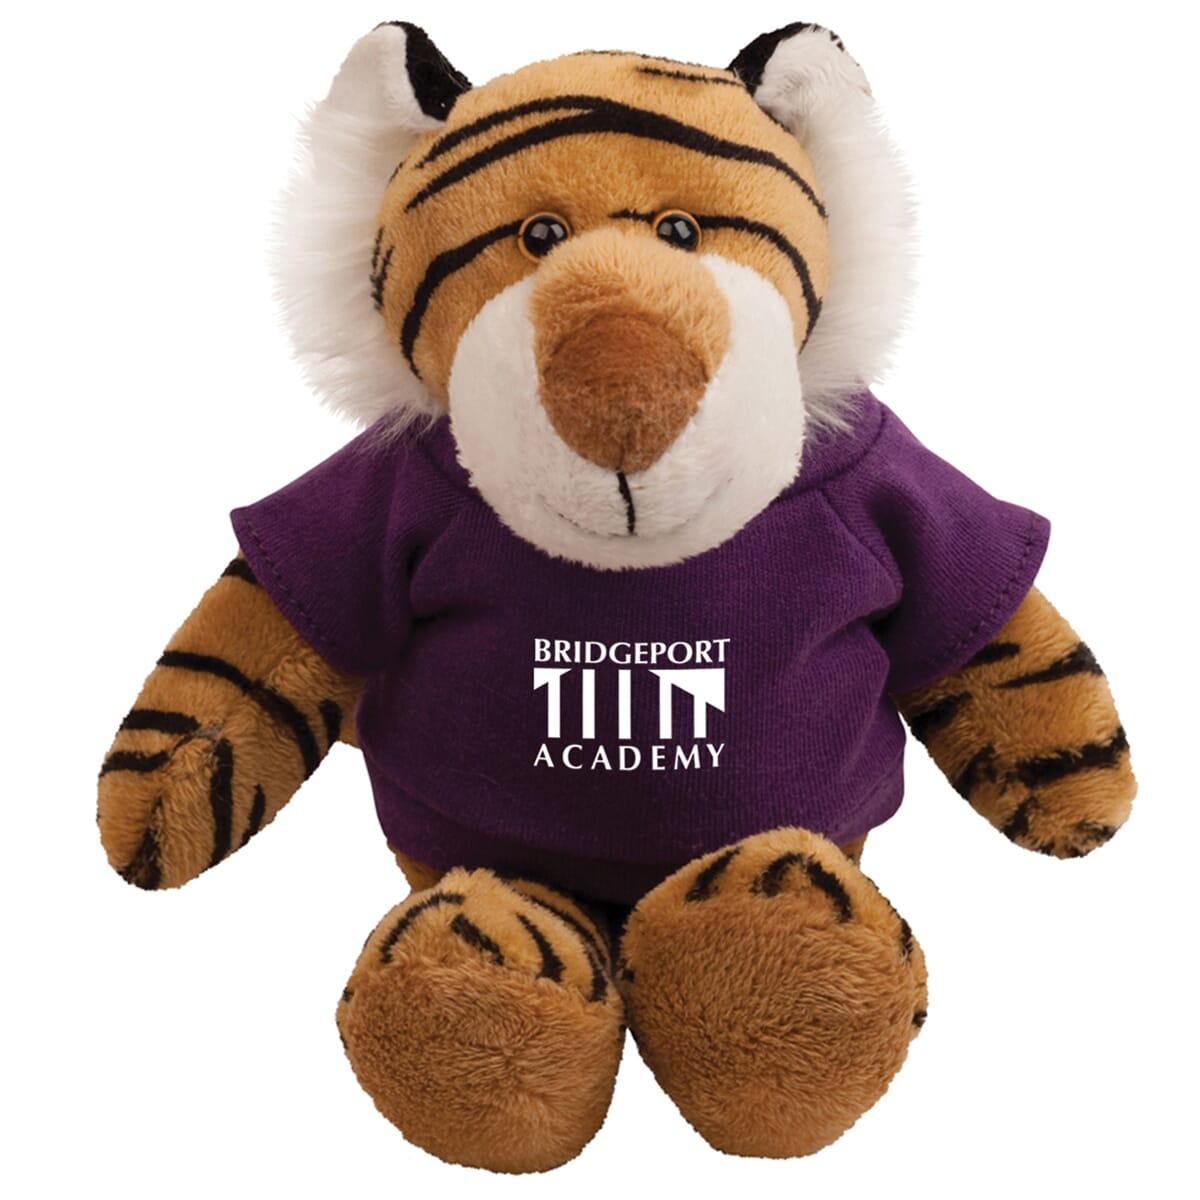 Tiger mascot stuffed animal with purple t-shirt